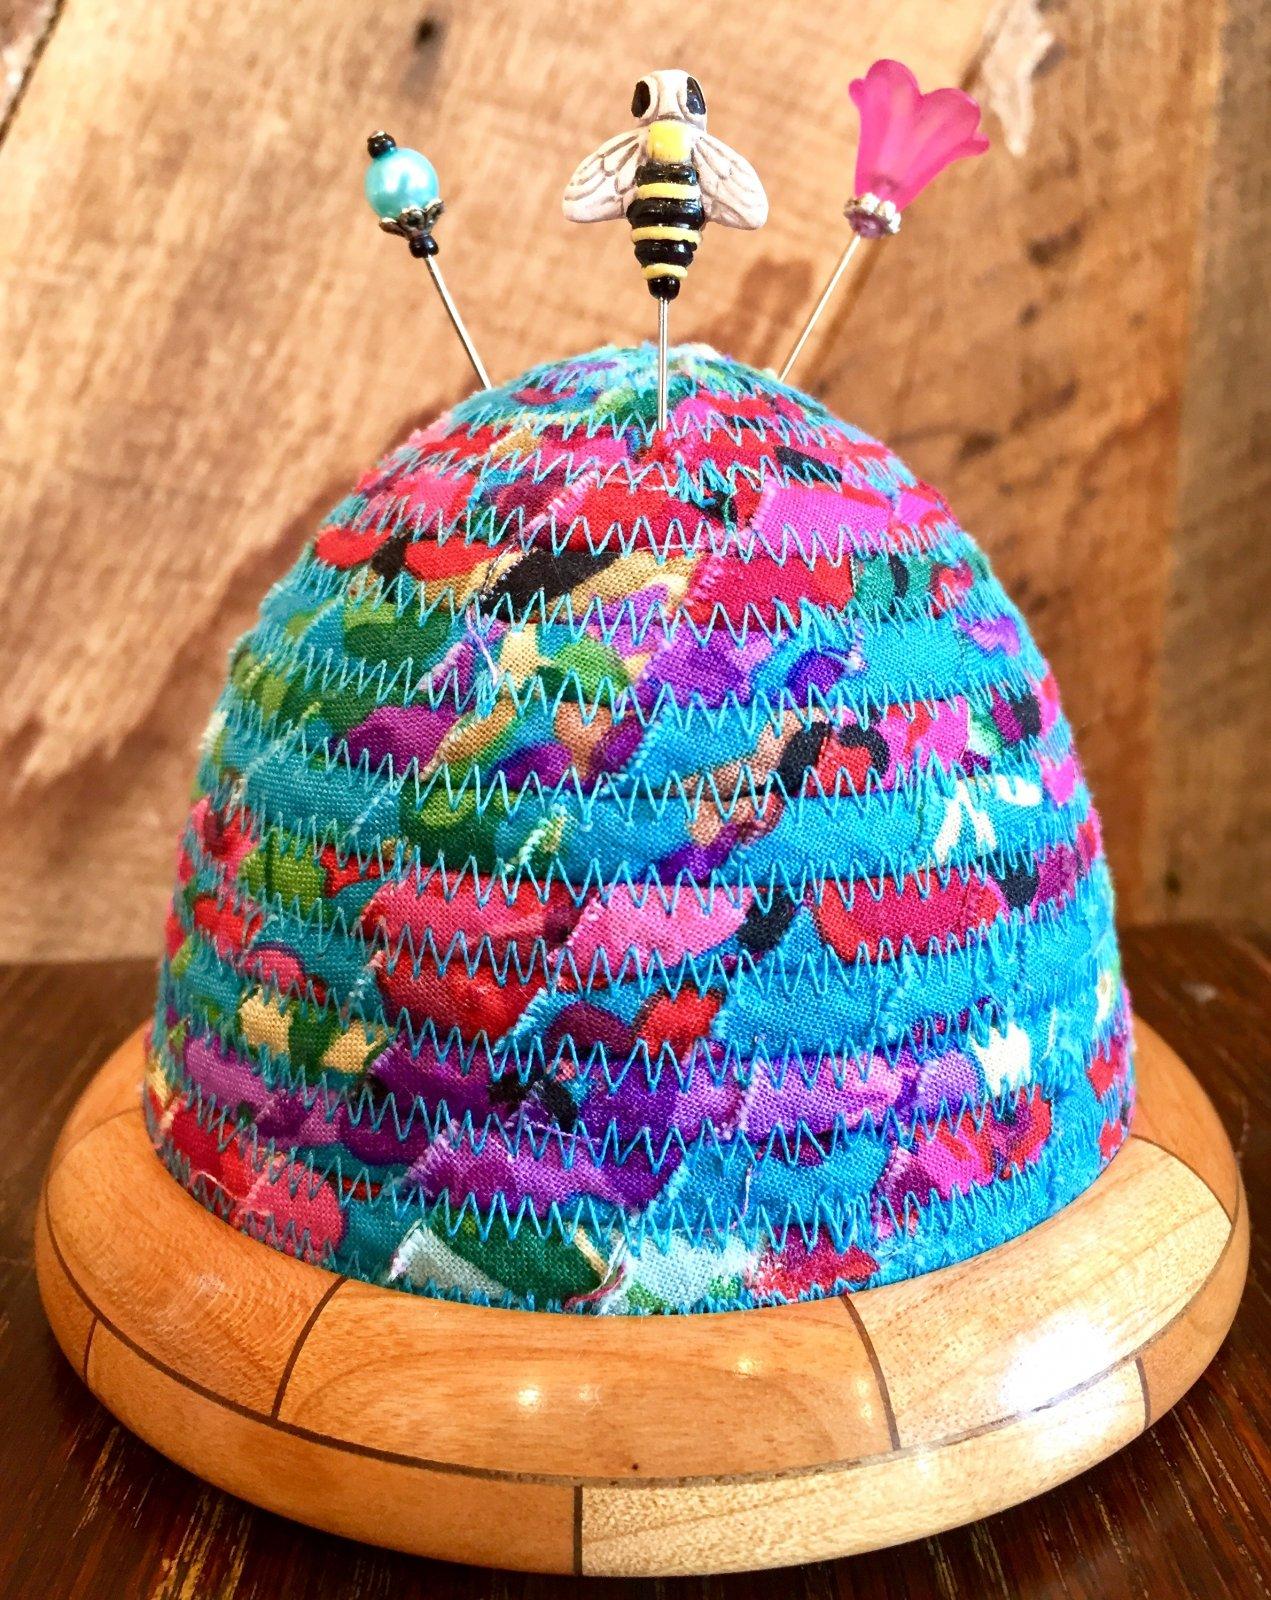 Beehive Pincushion - Teal Top - Cherry/Walnut Base